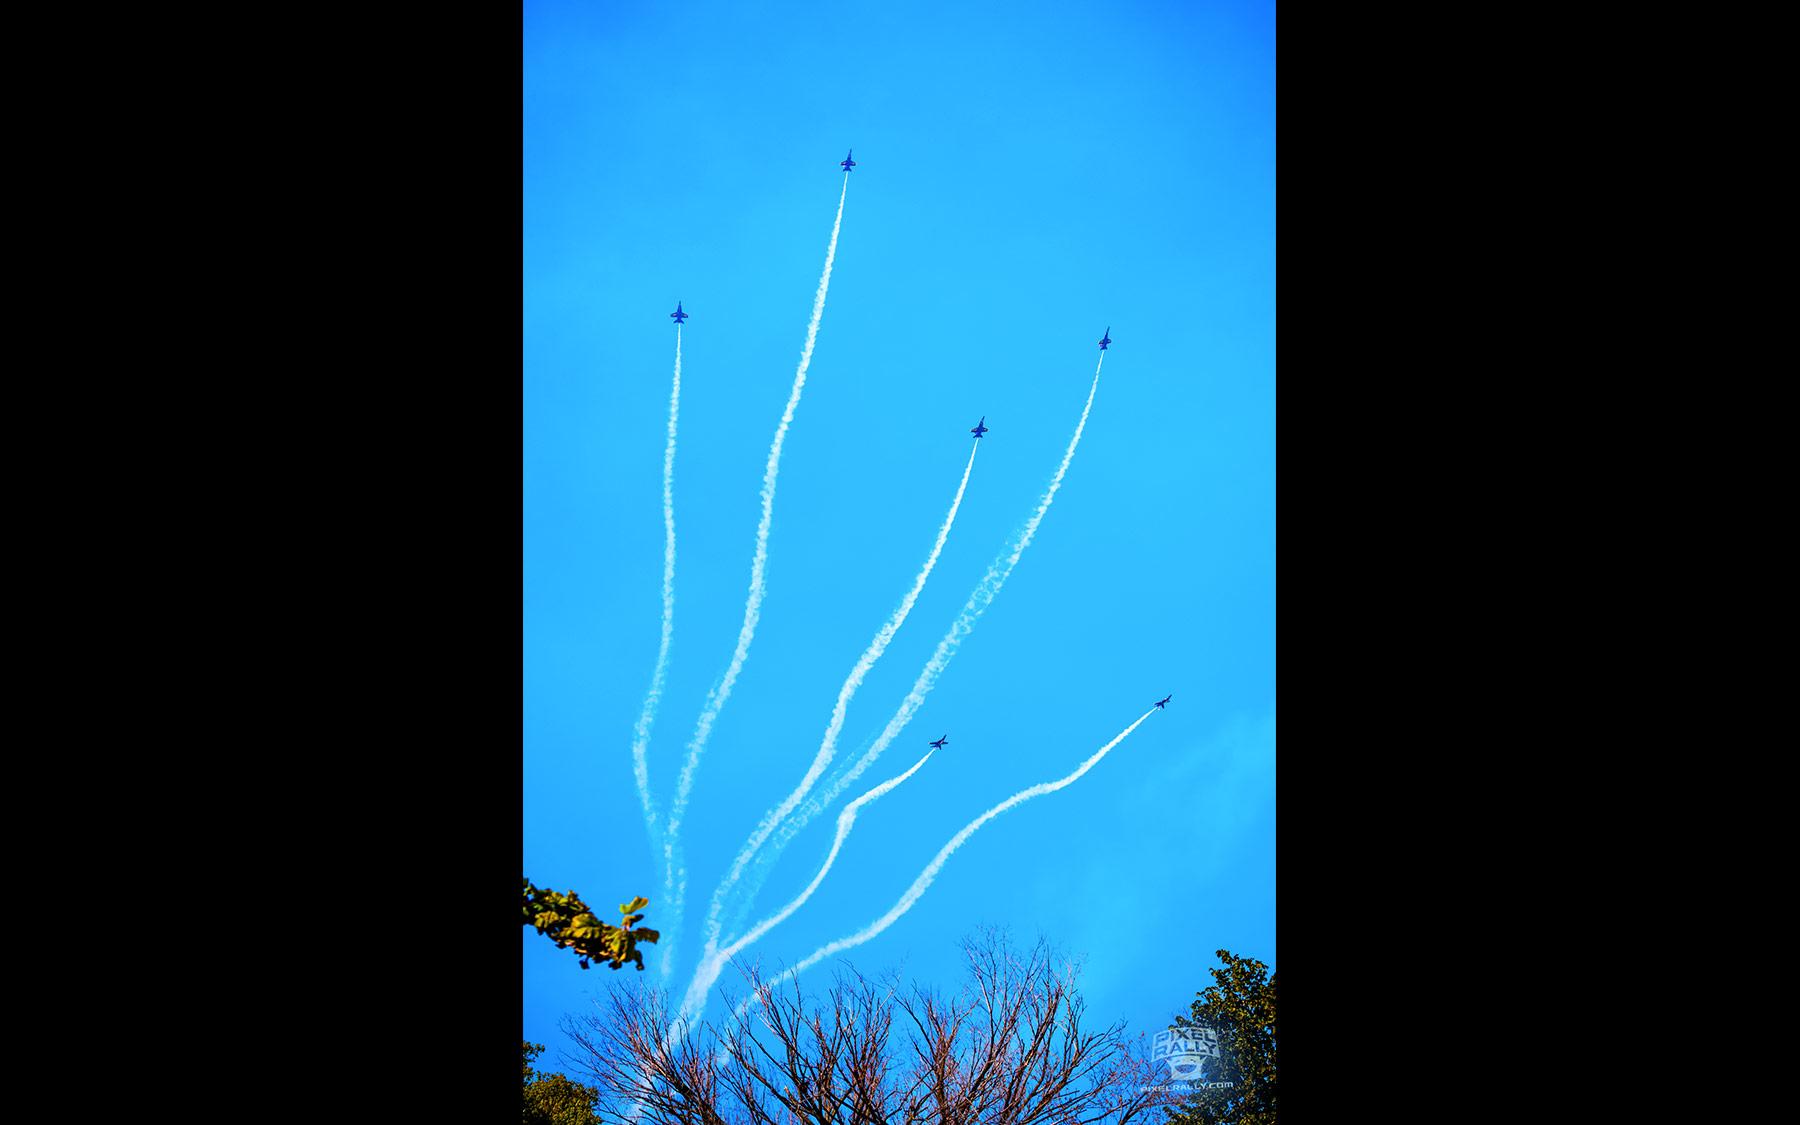 Blue-Angels-23-Blue-Angels-22-six-smokin-break